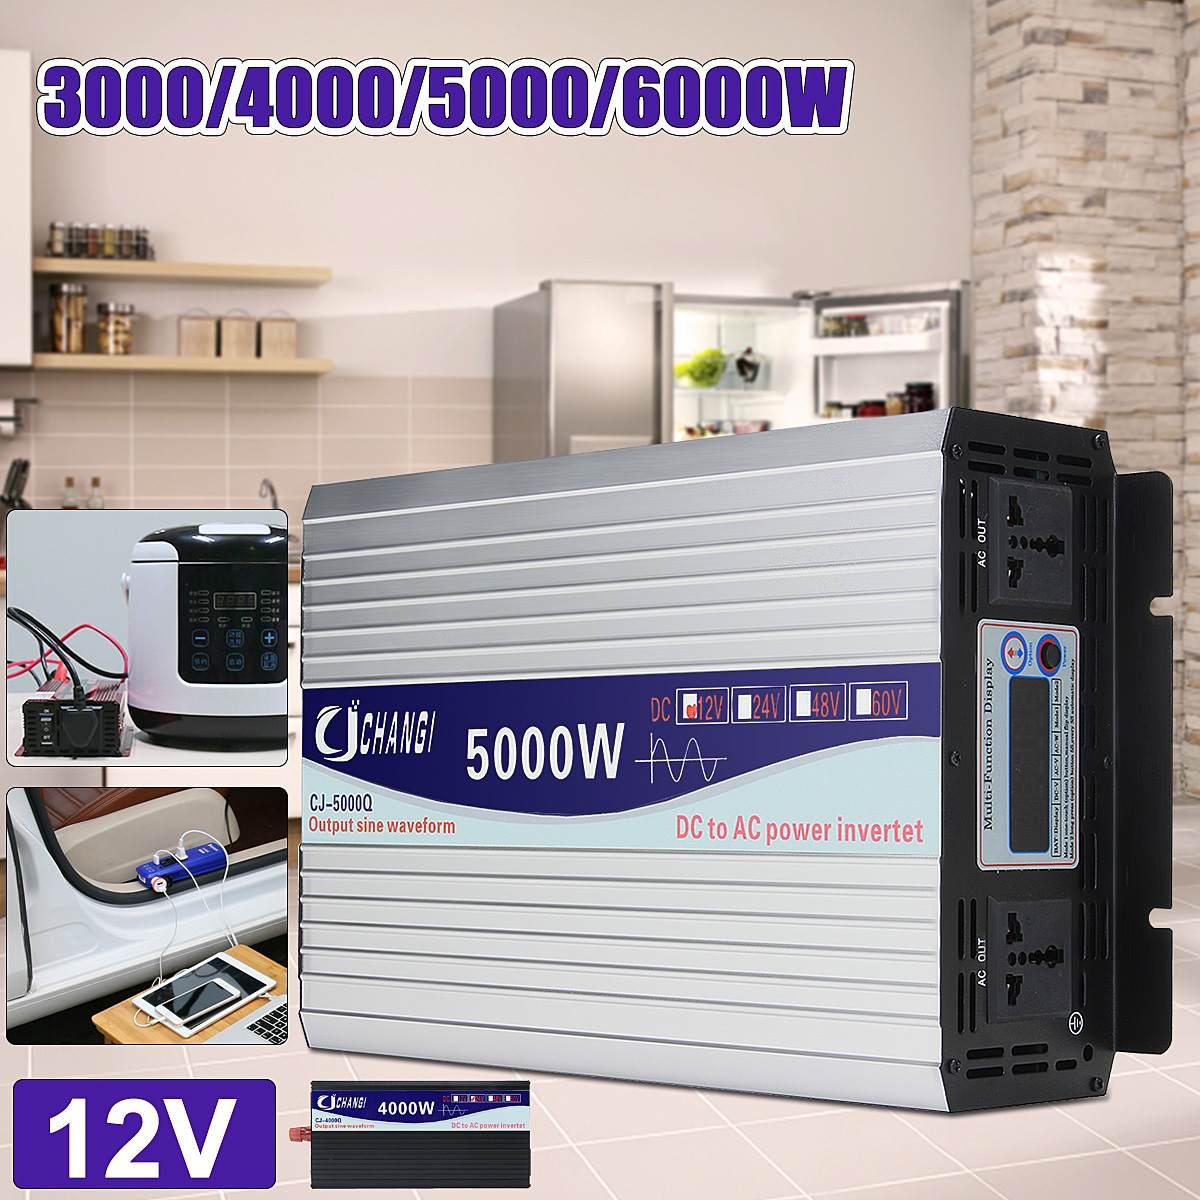 Écran Intelligent pur onduleur à onde sinusoïdale 12 V/24 V à 220 V 3000 W/4000 W/5000 W/6000 W convertisseur écran LCD